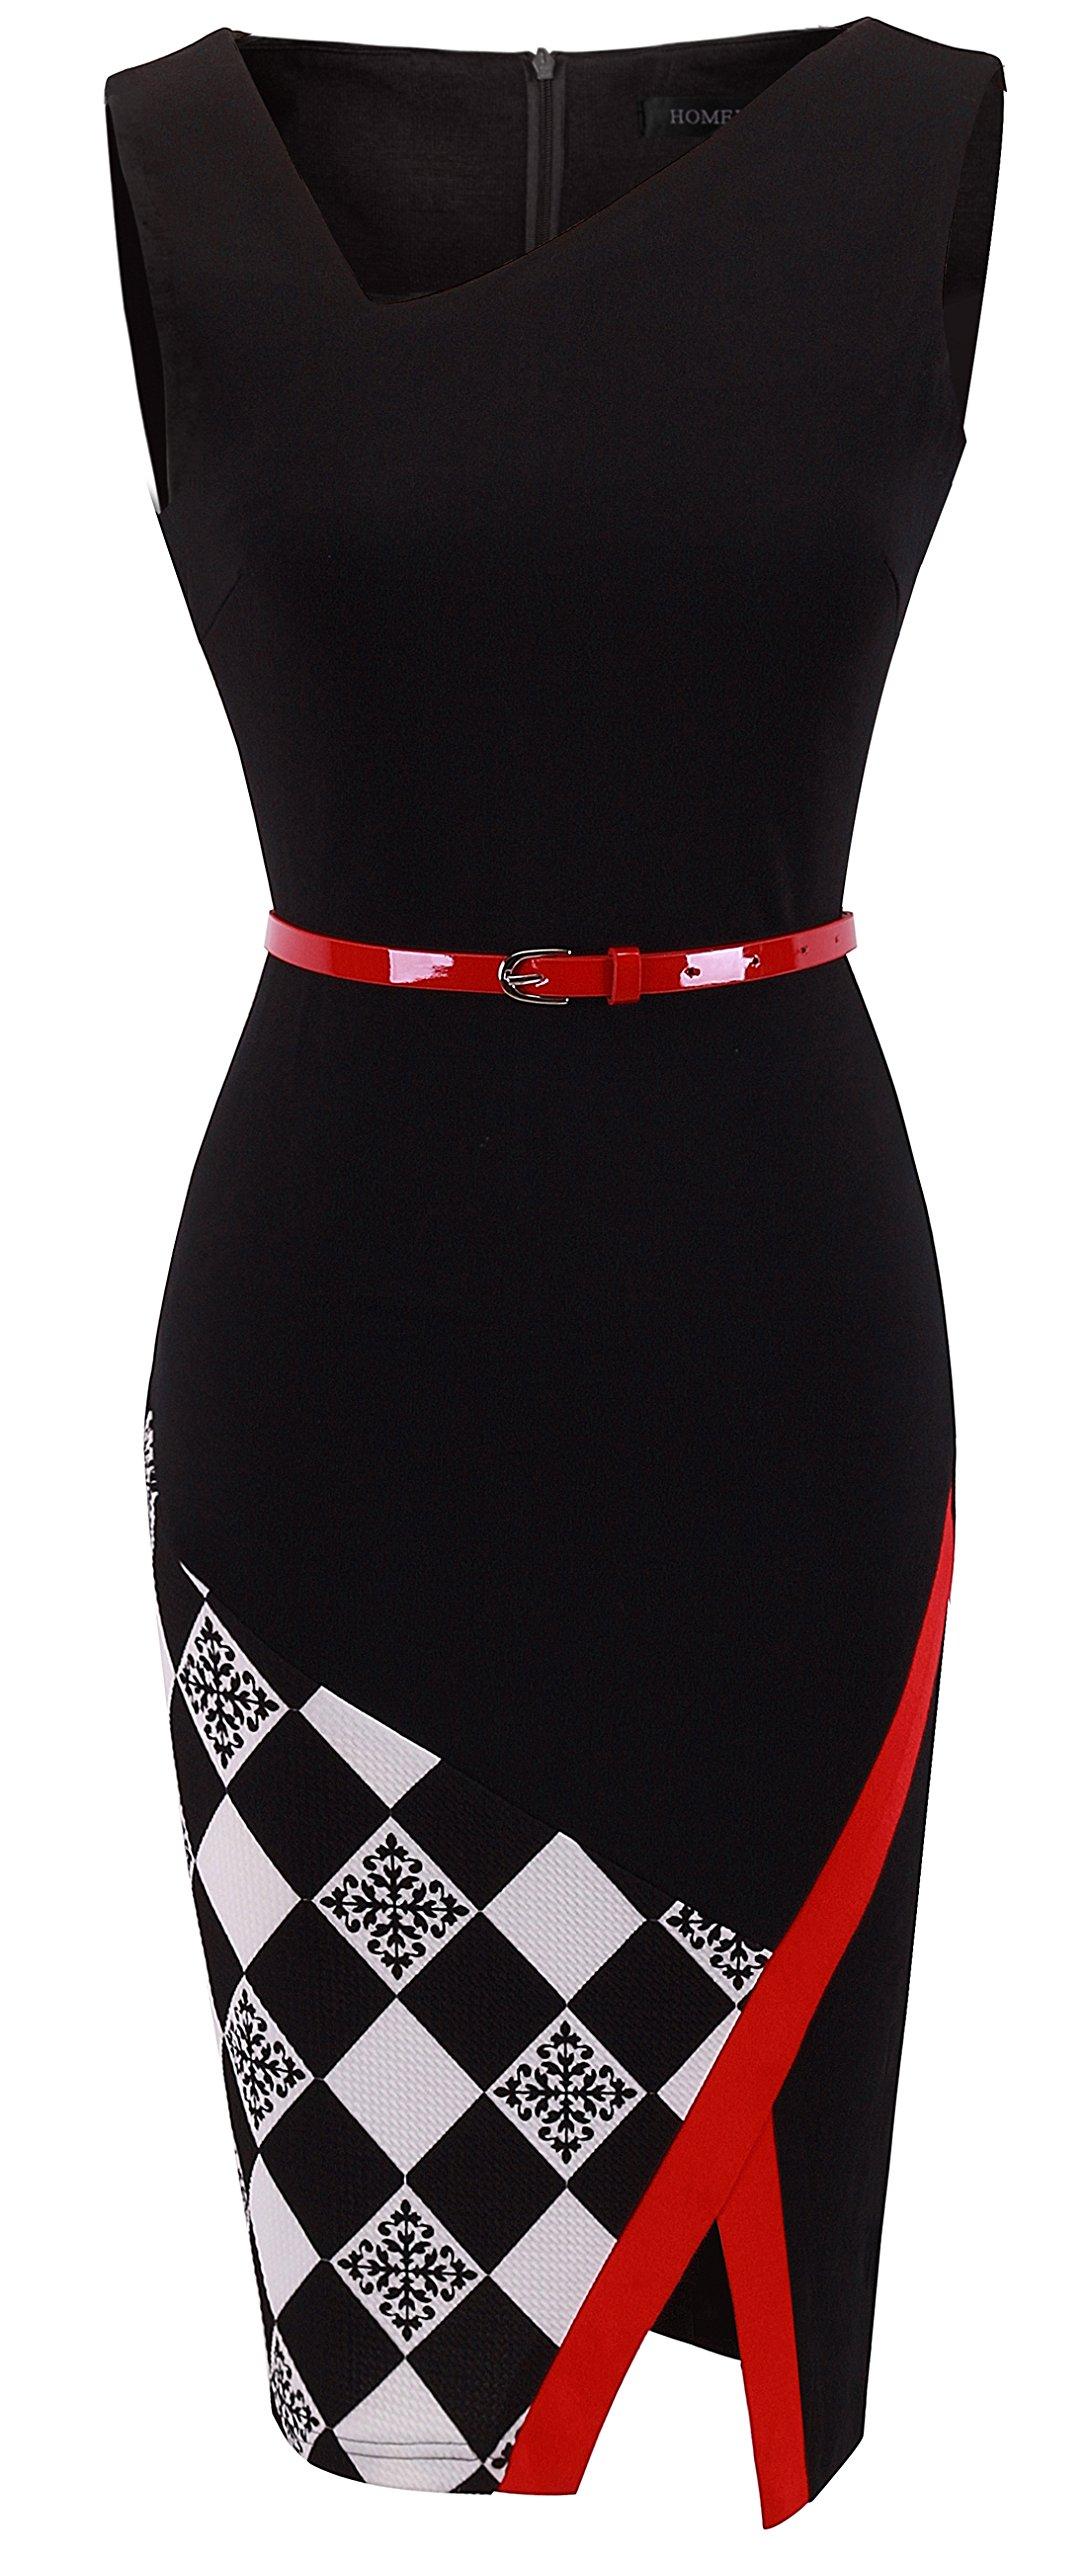 HOMEYEE Women's Elegant Patchwork Sheath Sleeveless Business Dress B290 (XL, Black)